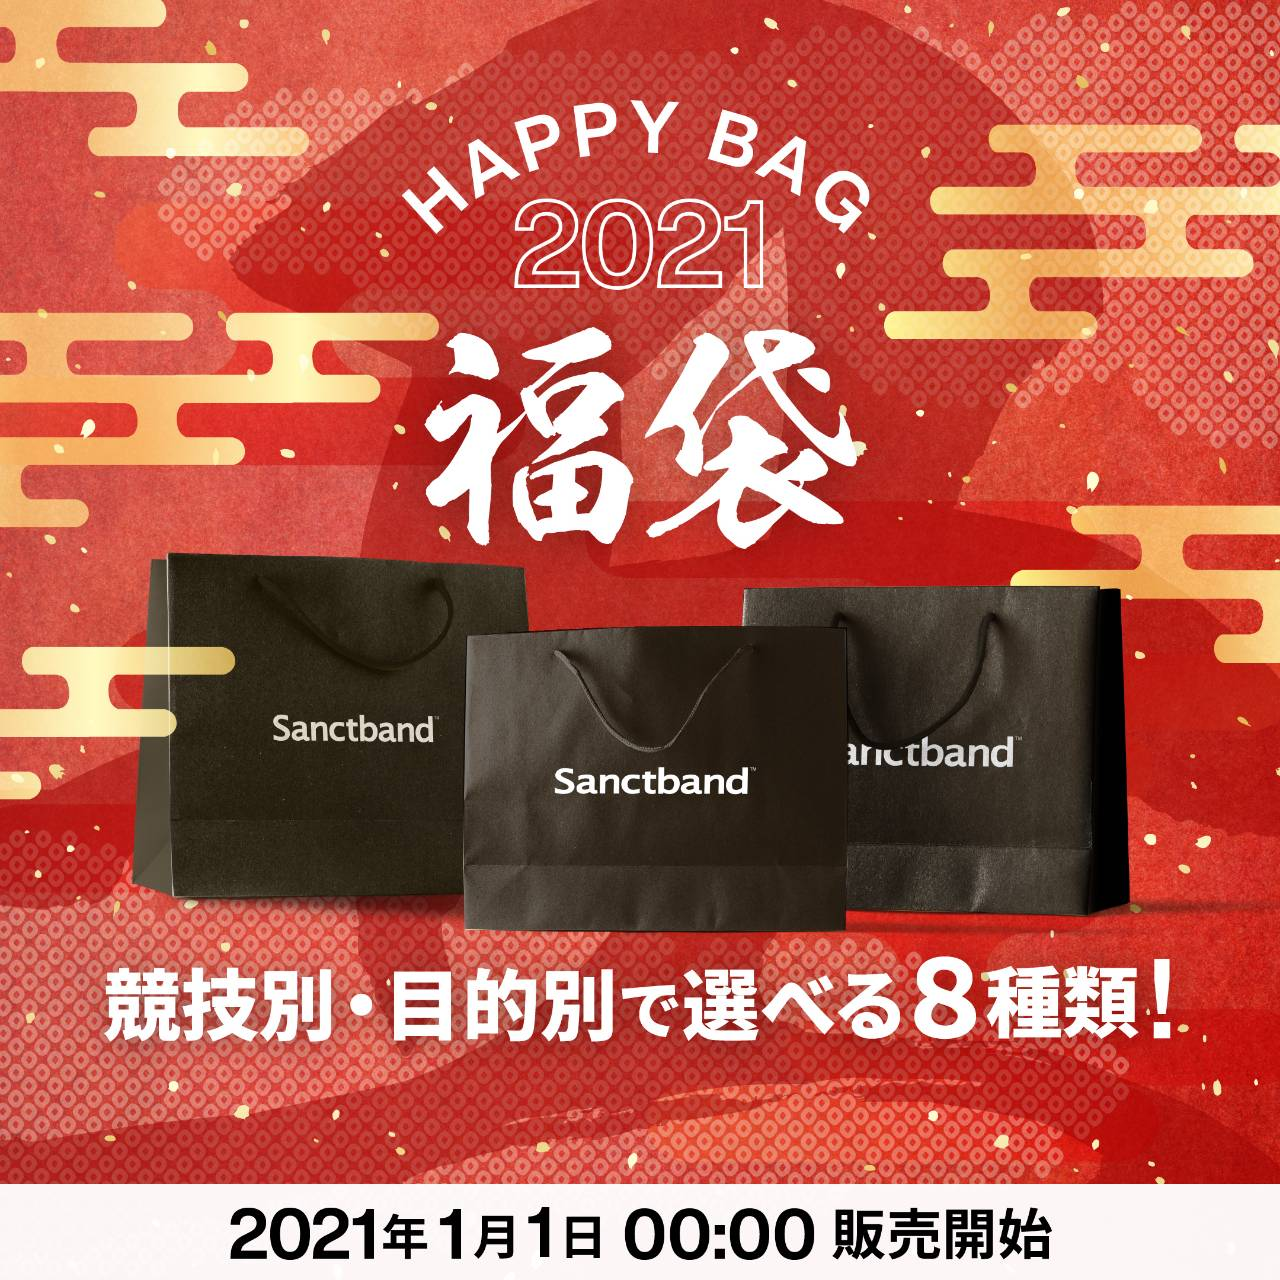 Sanctband 2021年 中身丸わかり初売り福袋!